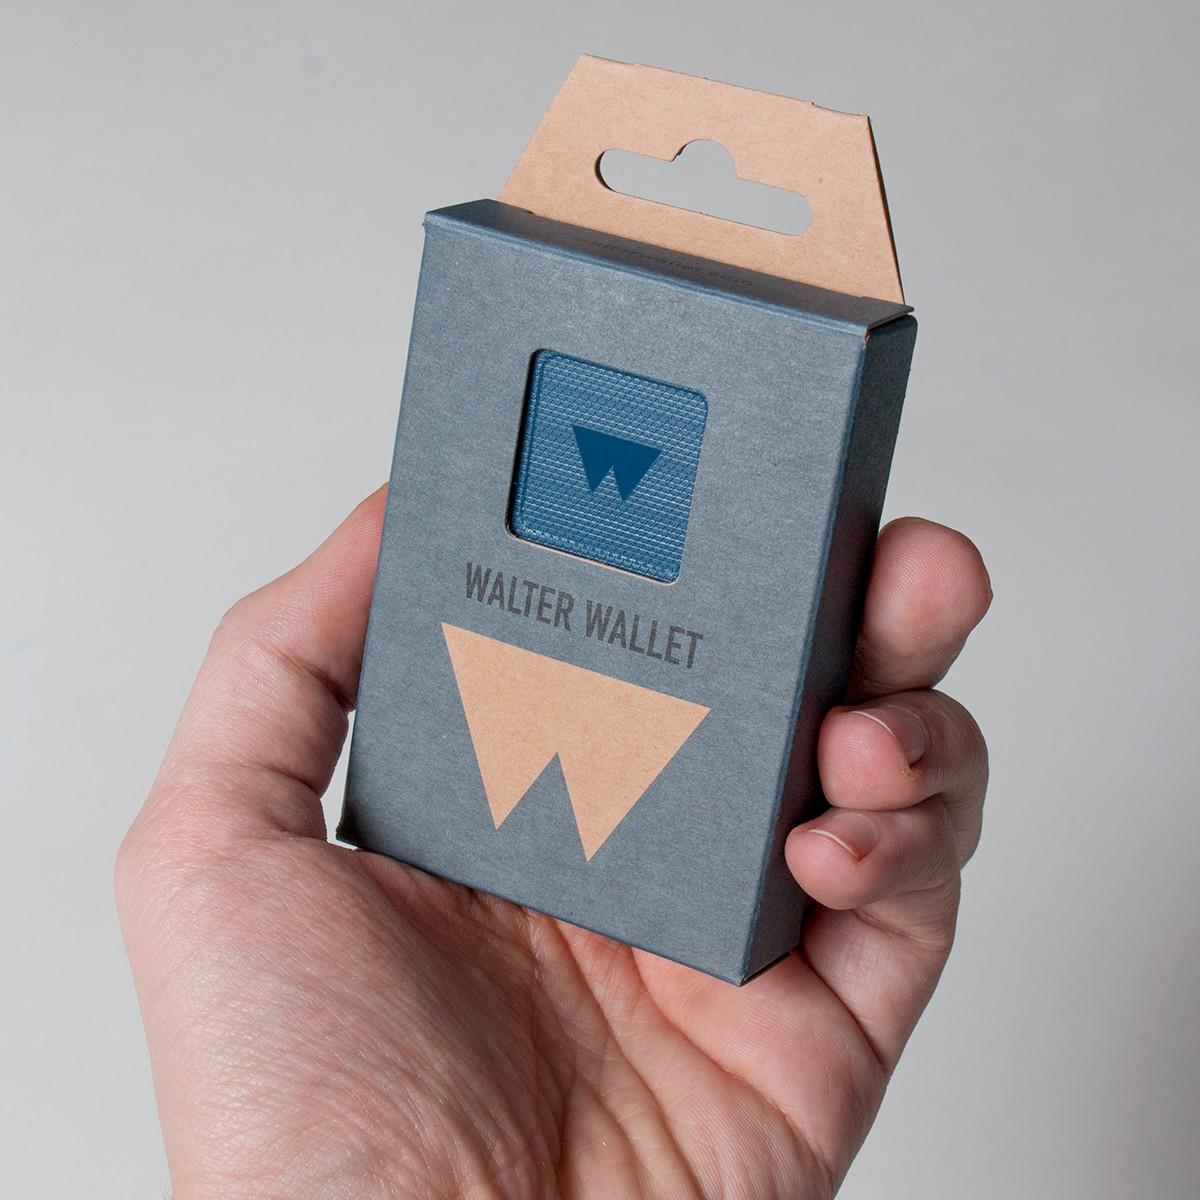 荷蘭 Walter Wallet 輕巧錢包20